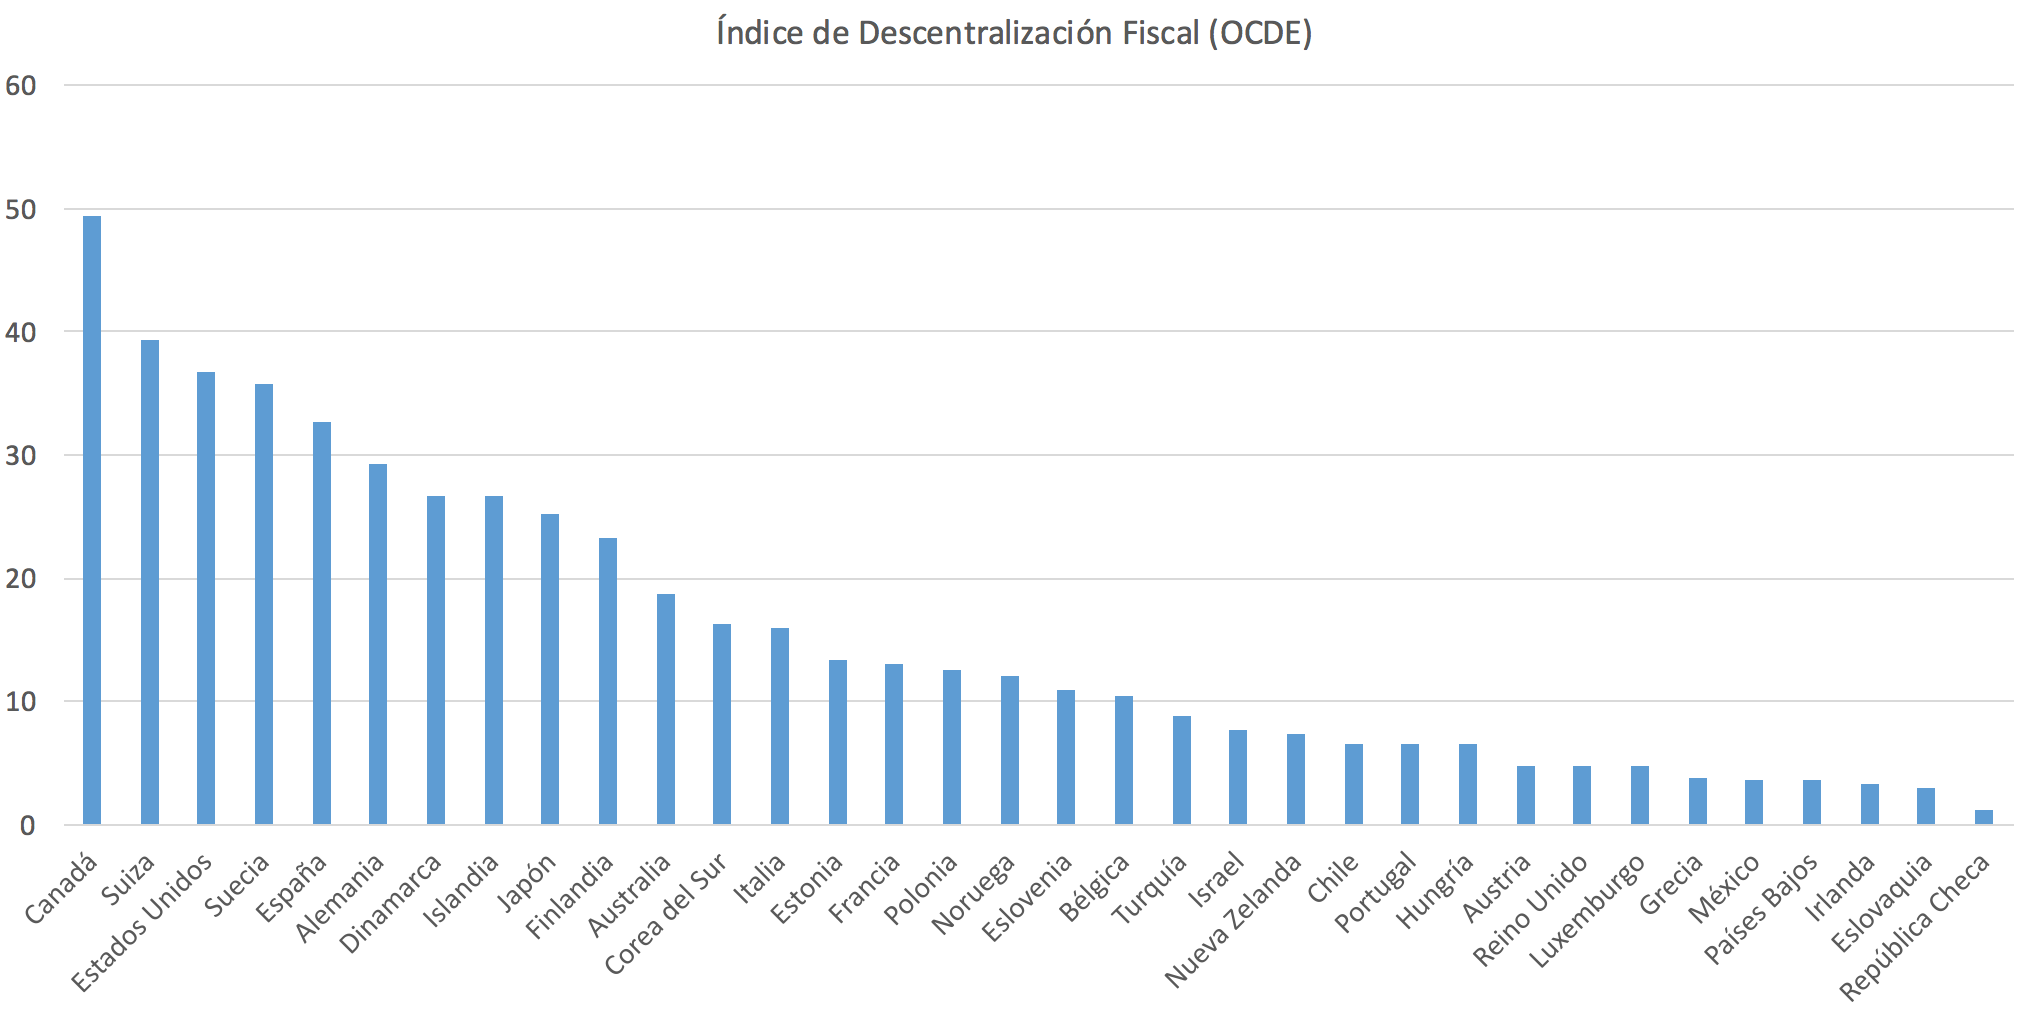 Indice-descentralizacion-fiscal.png